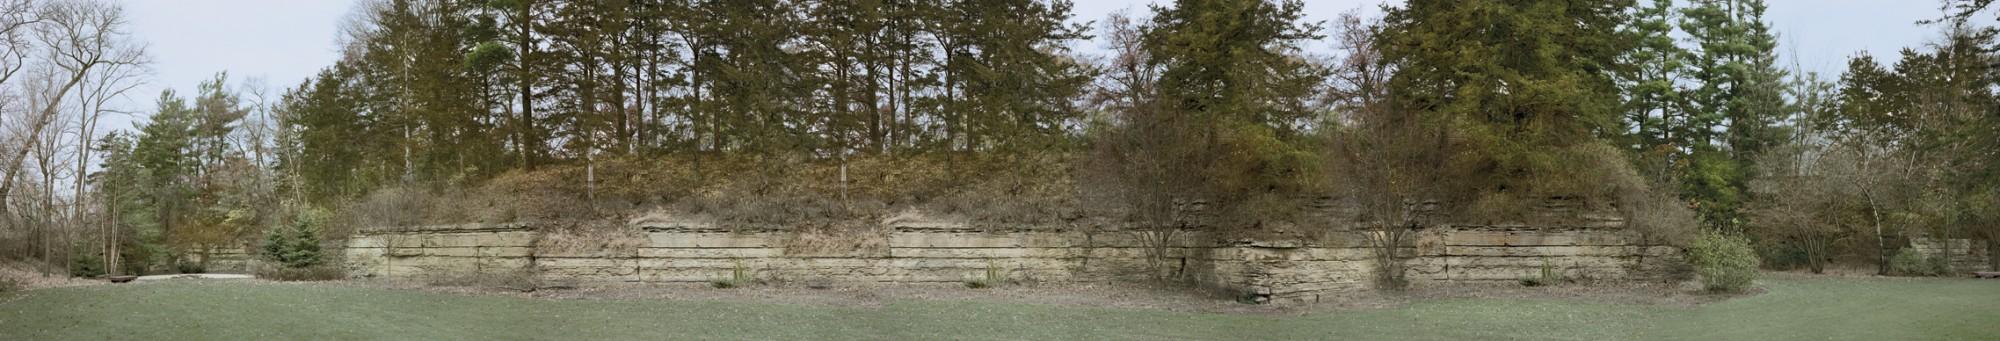 Autumn wall in Minnesota, Richard Lund, translite,